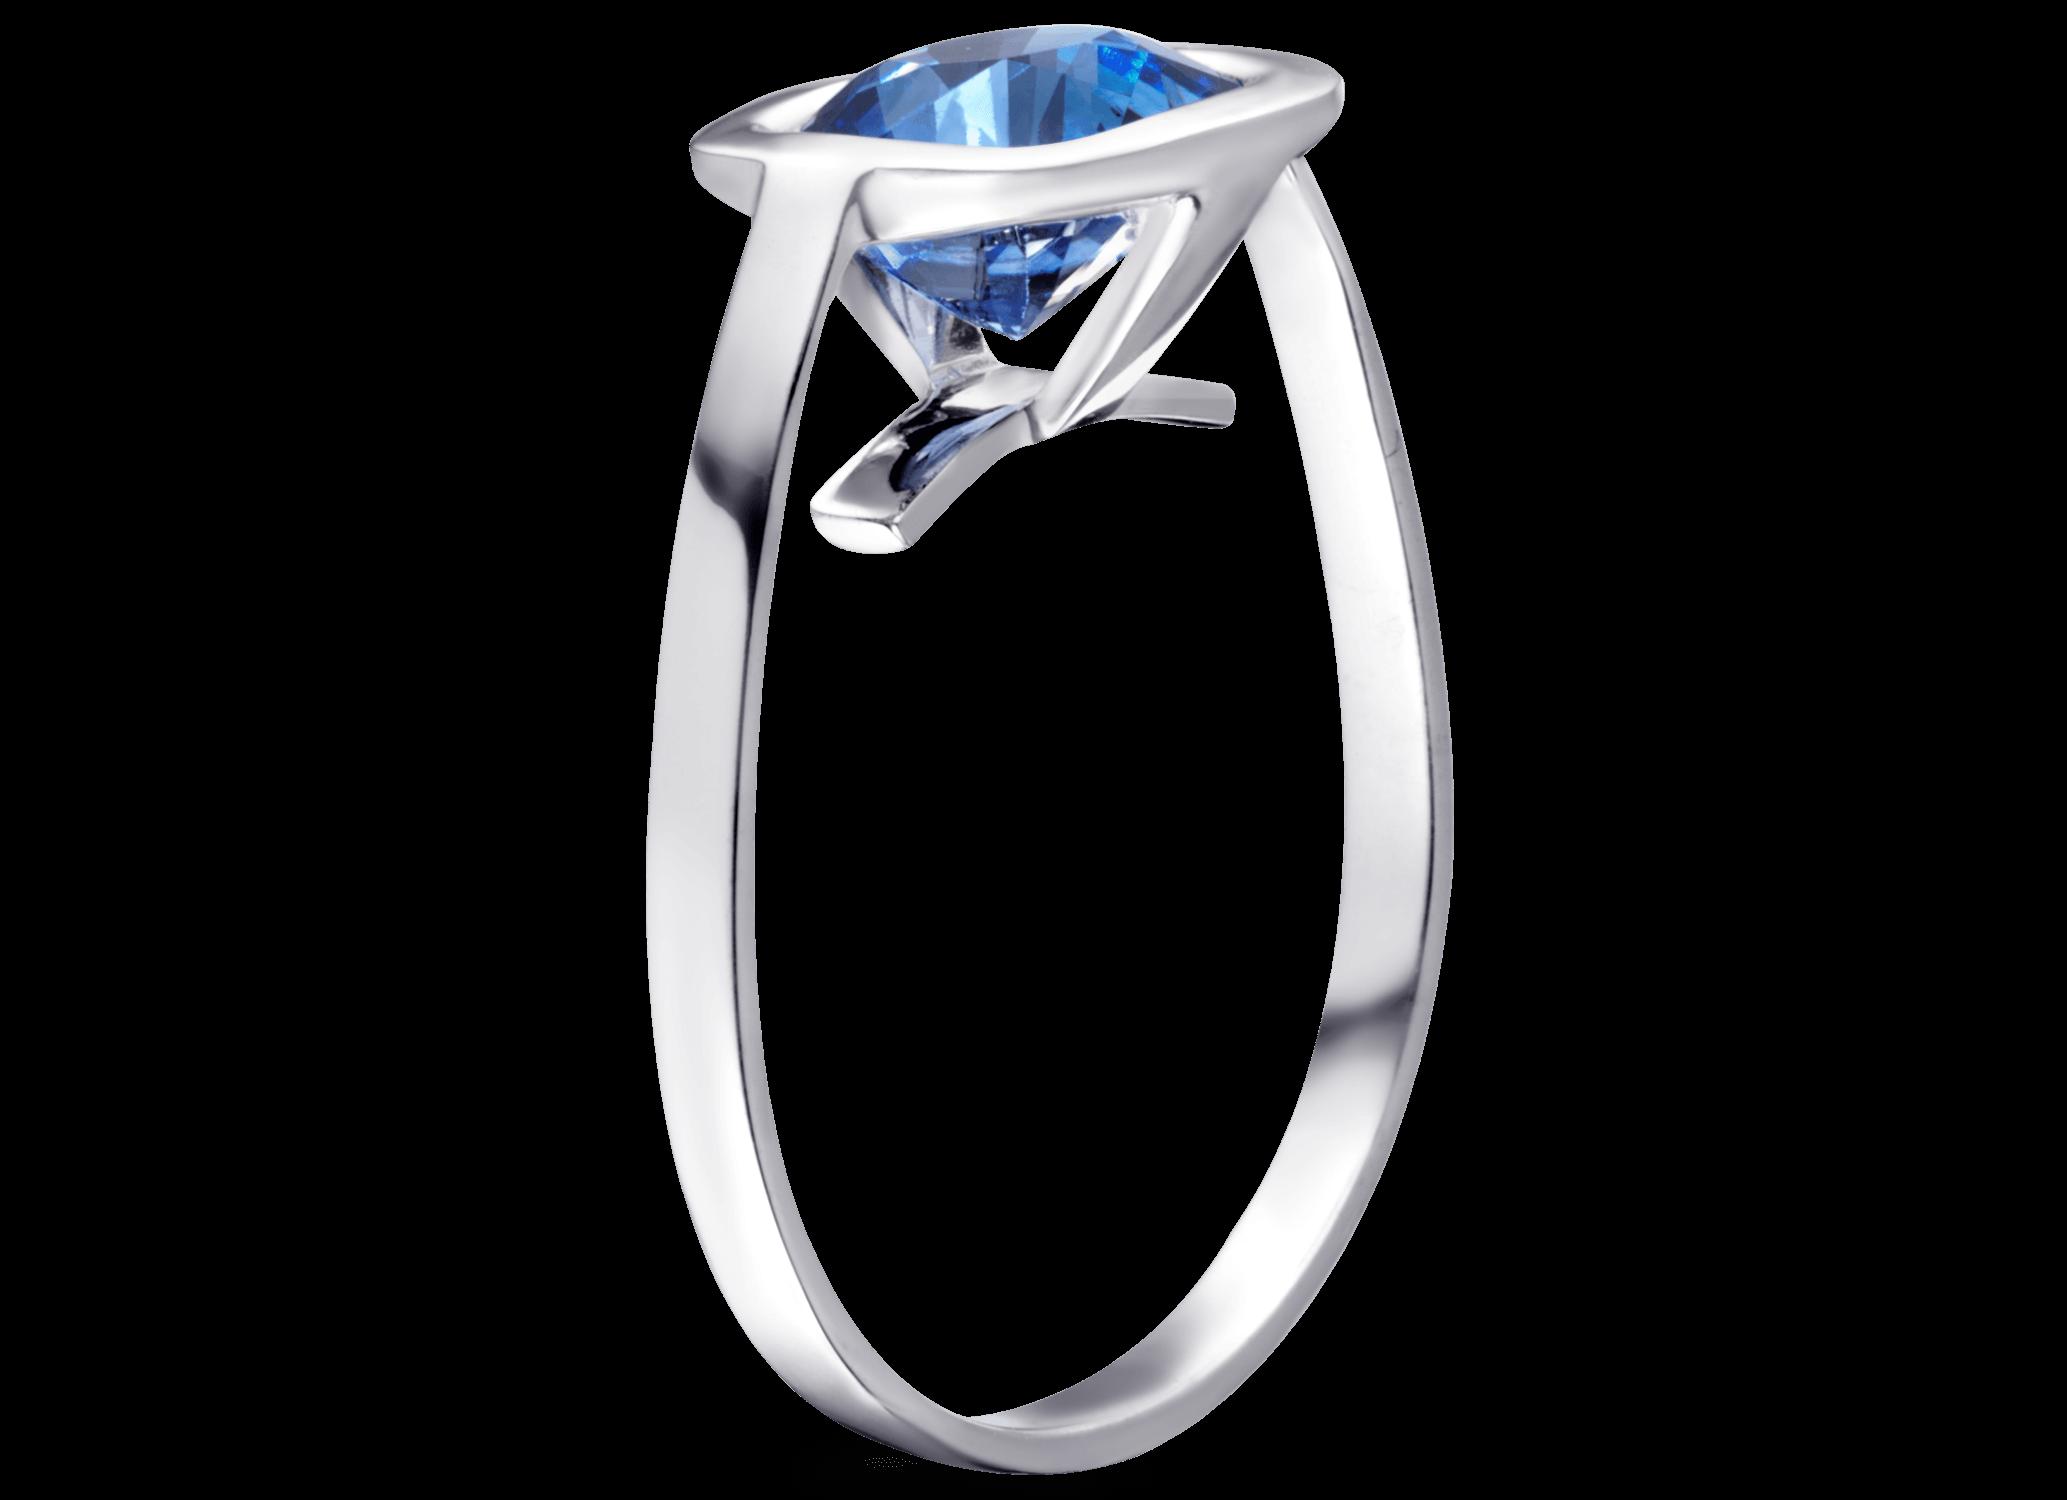 Bague Cha or blanc et saphir bleu coussin 2,05 carats perspective PNG web.png